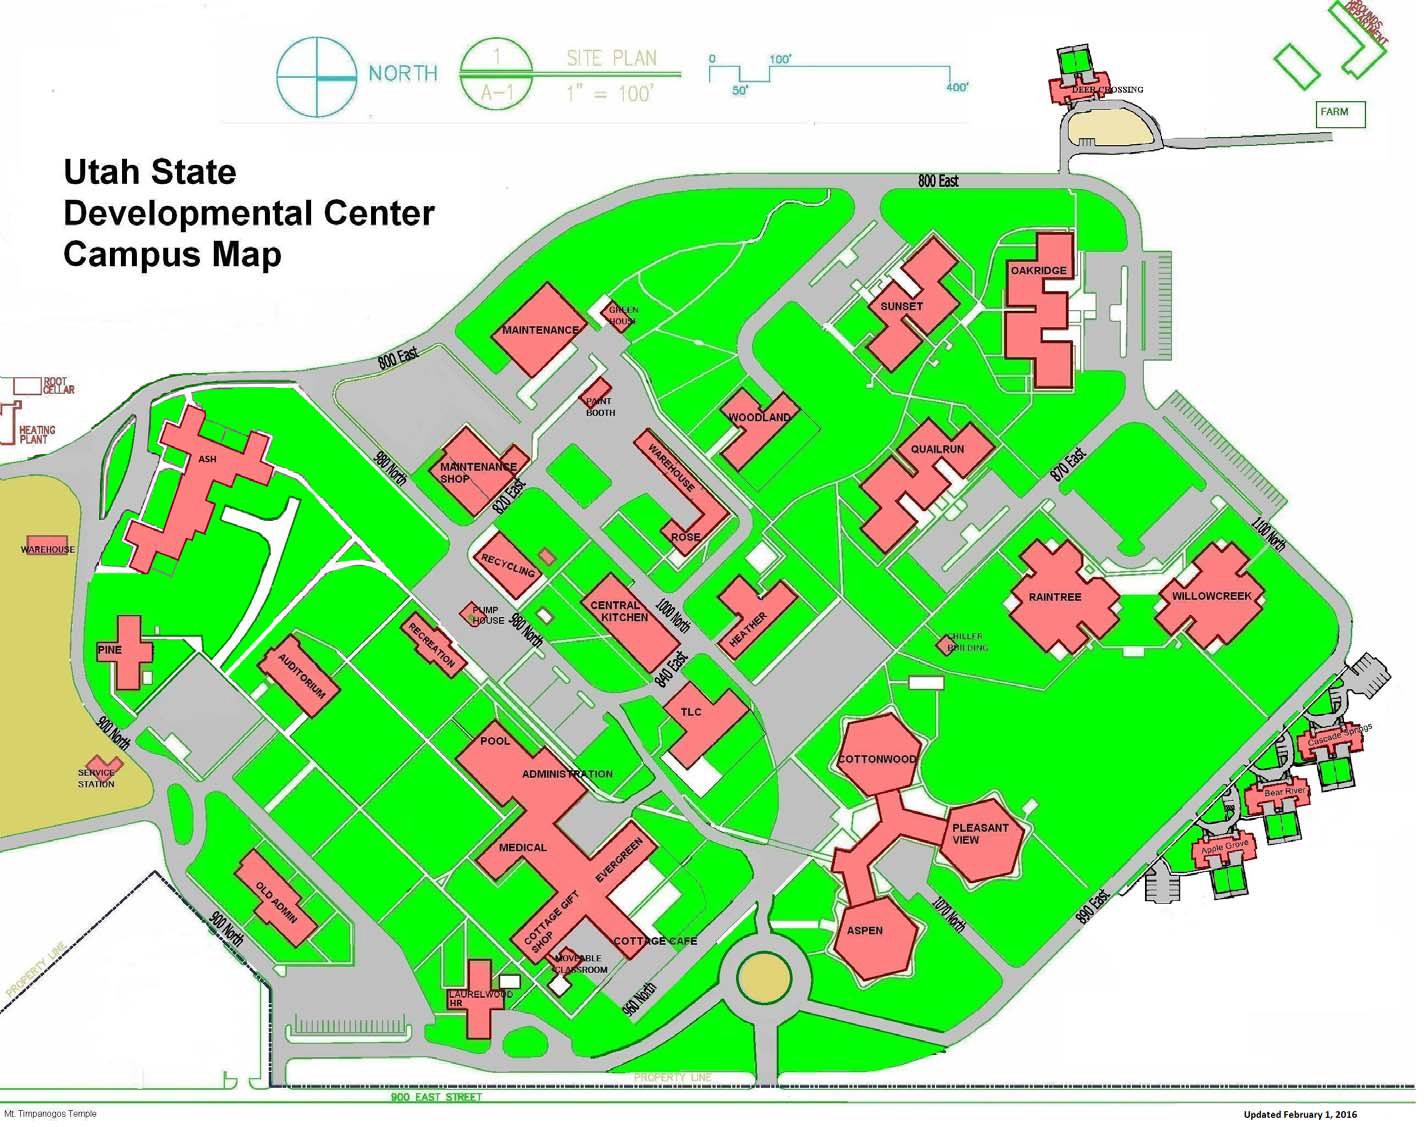 Download Printable Campus Map